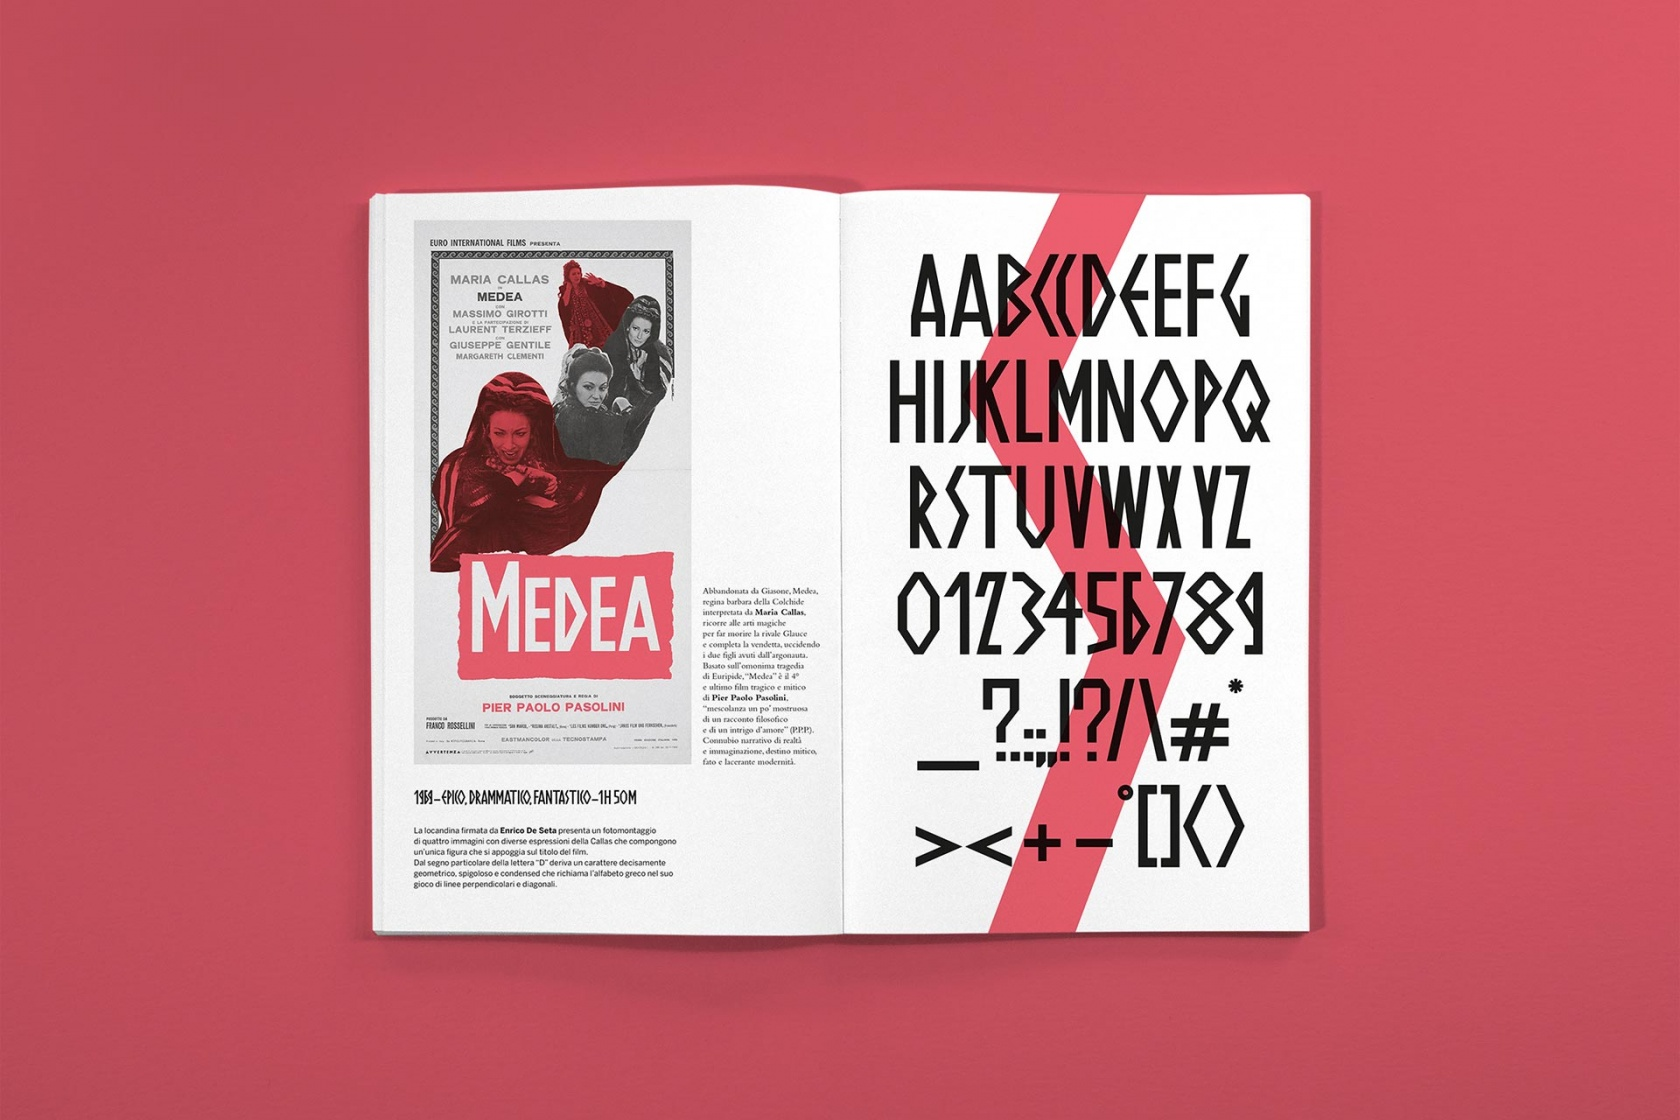 agenda 2020 12 a 1680x1120 q95